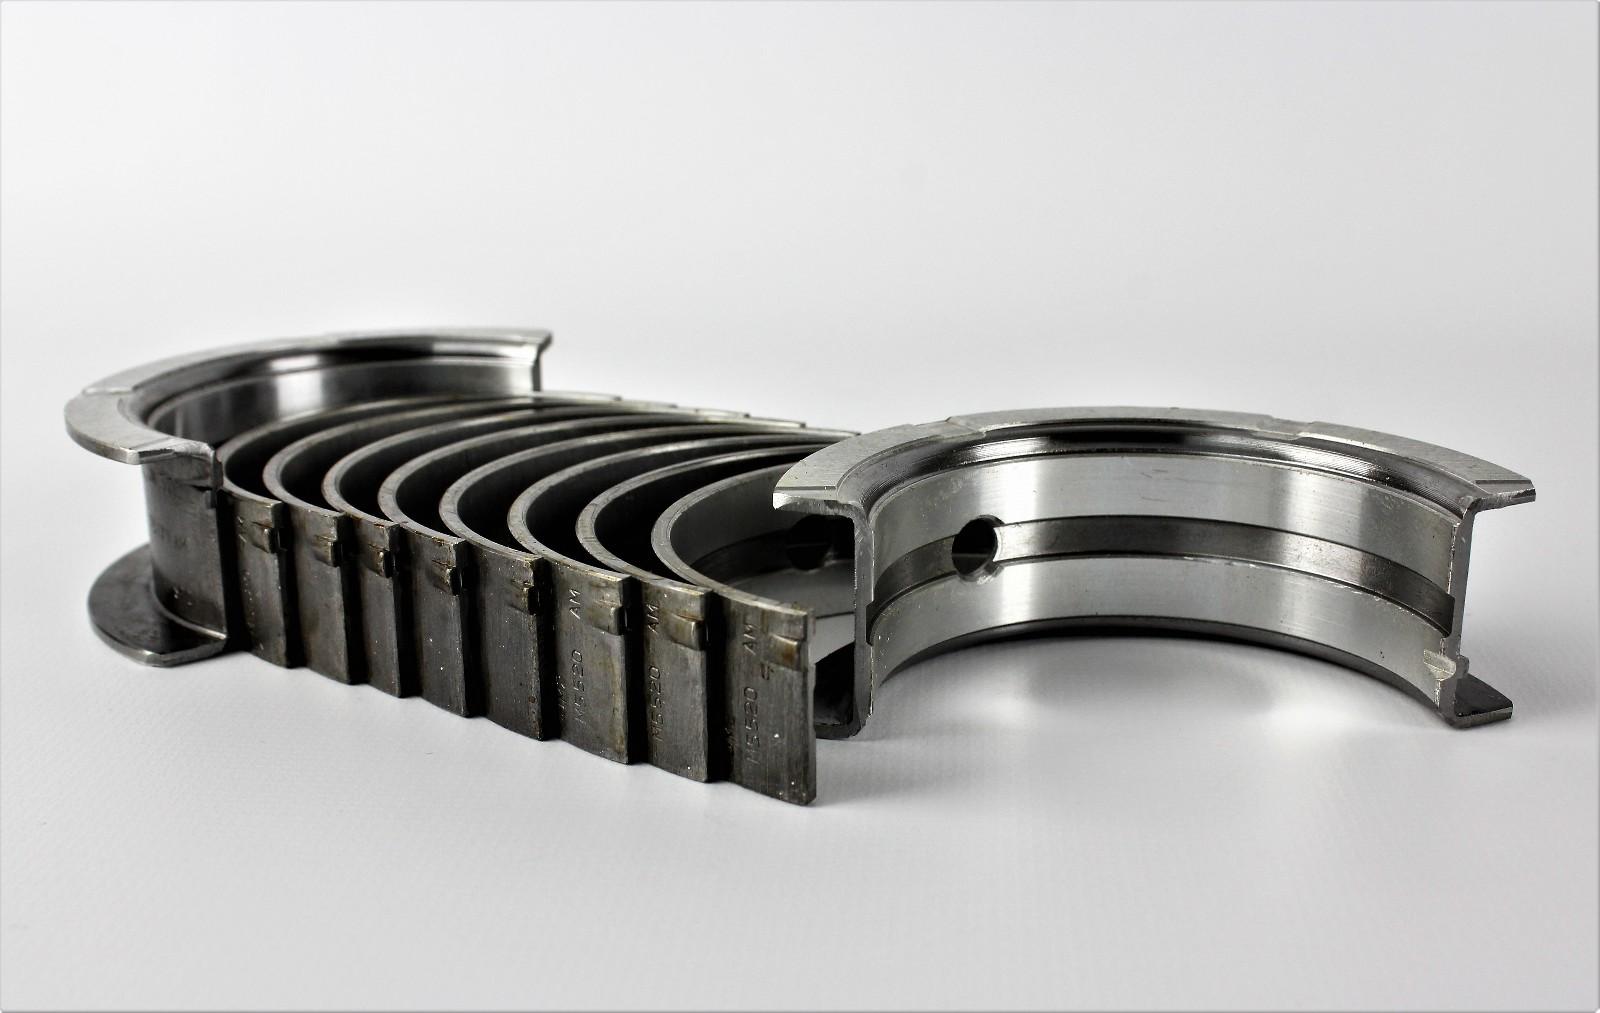 DNJ Engine Components MB800.10 Main Bearing